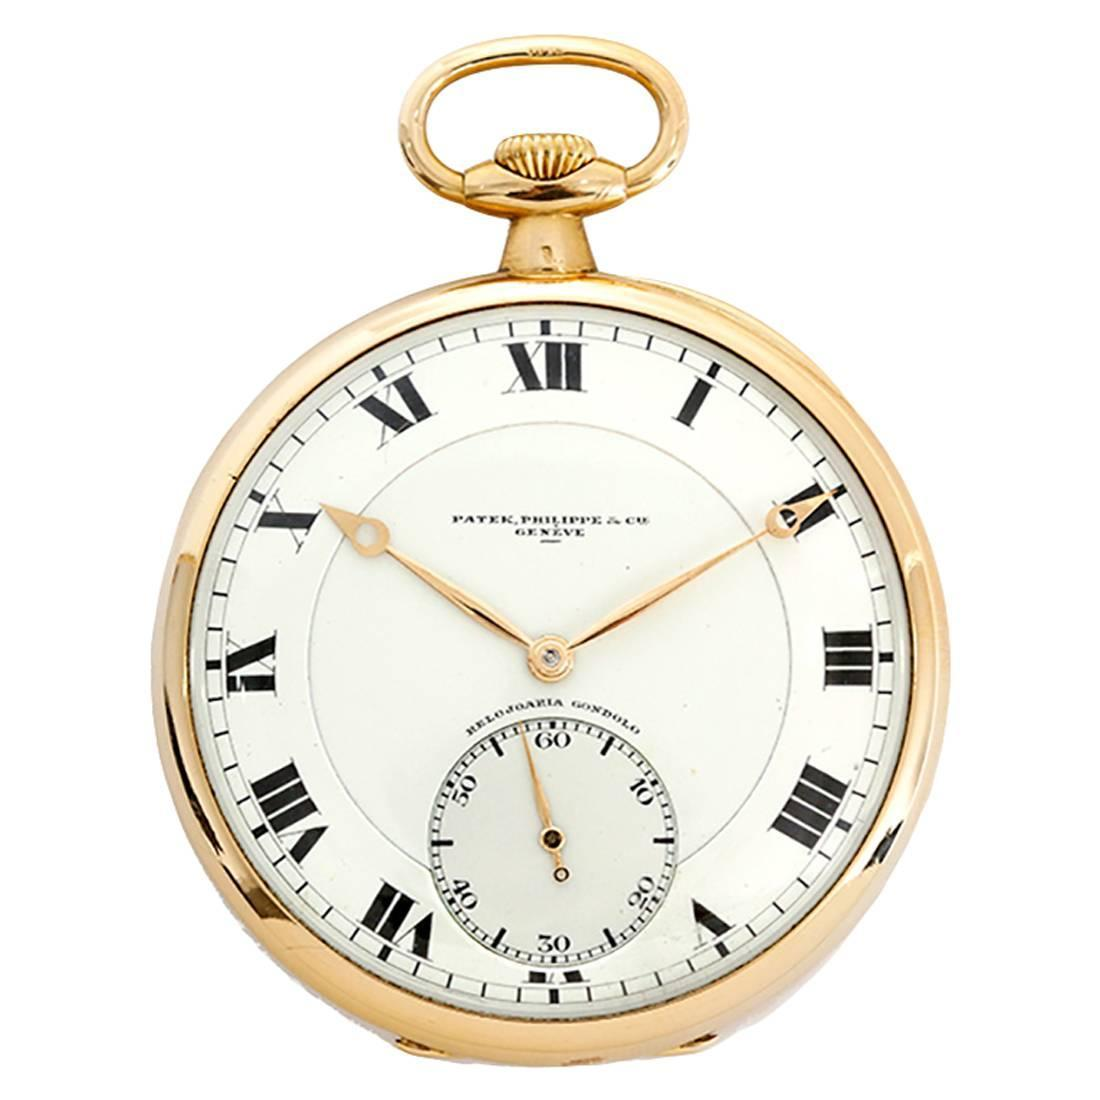 patek philippe yellow gold relojoaria gondolo open faced